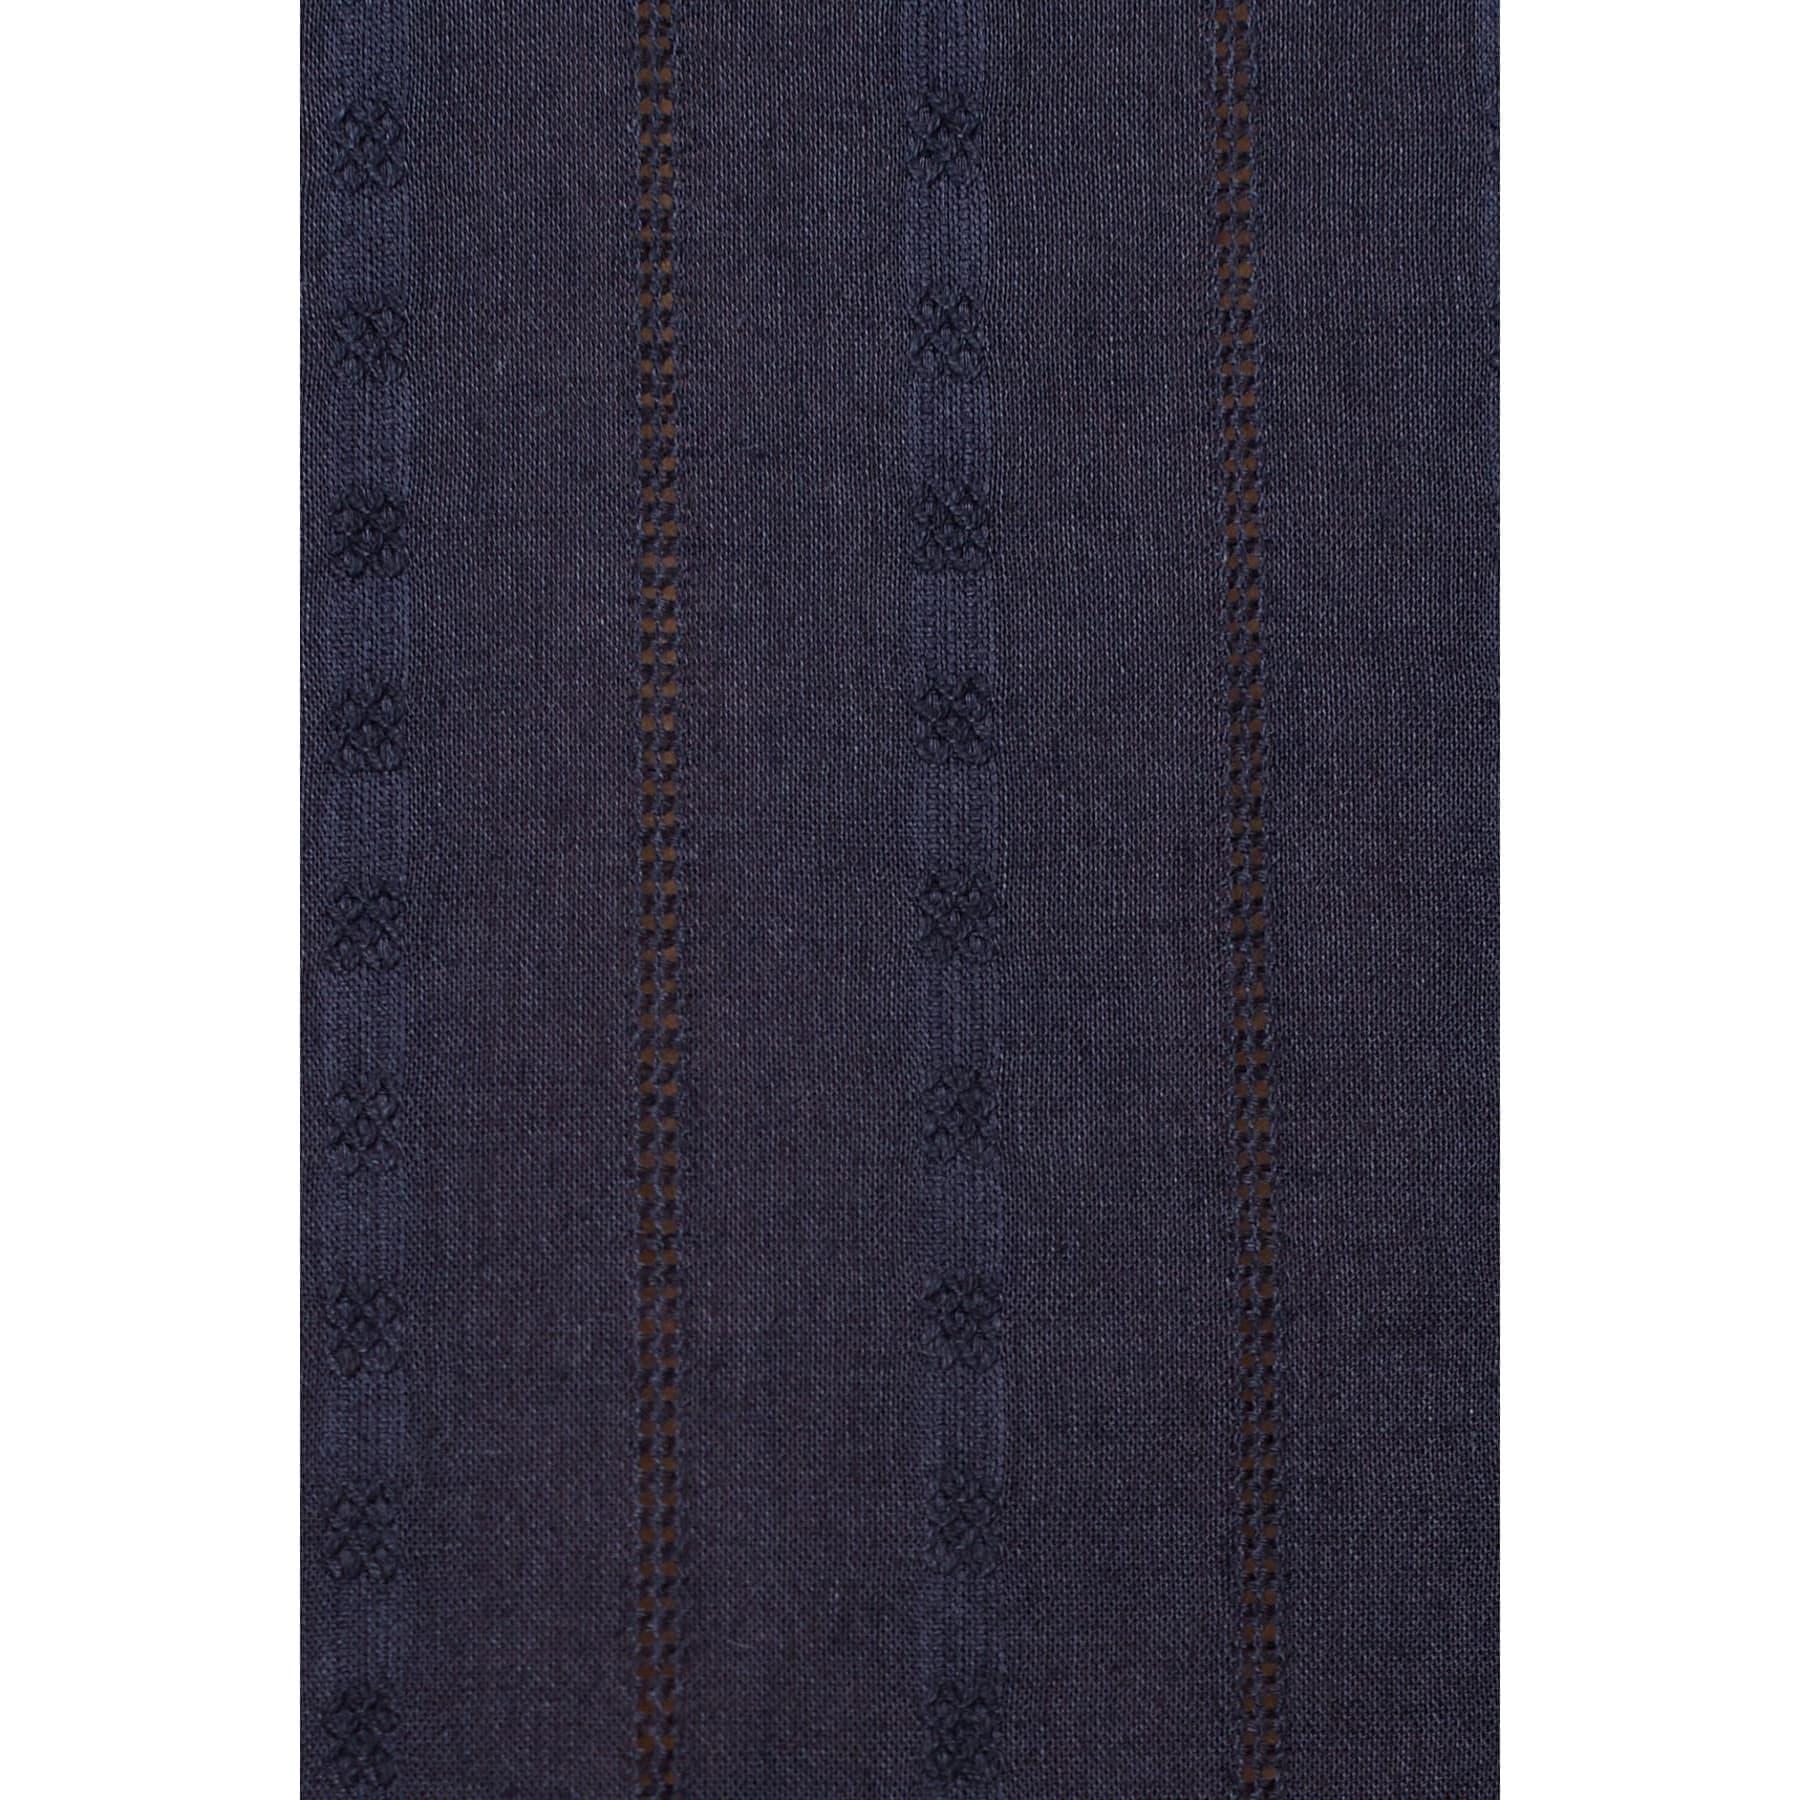 Bağcık Detaylı Mavi Bluz